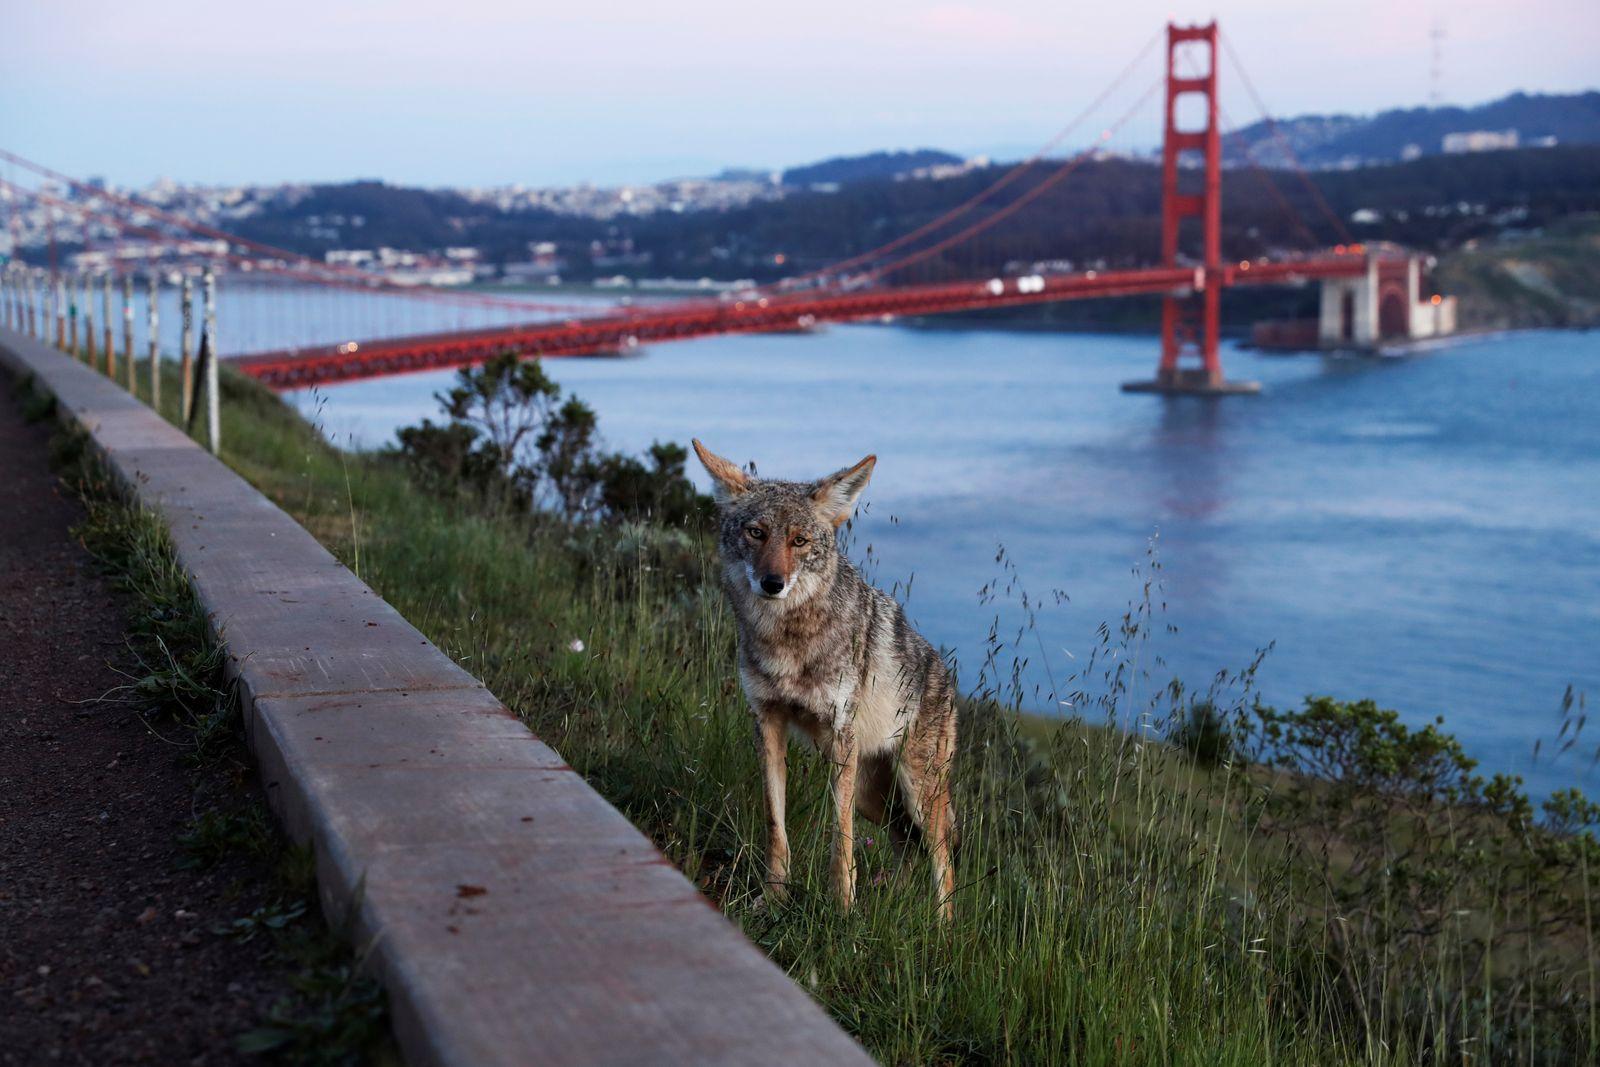 Outbreak of the coronavirus disease (COVID-19) in San Francisco, California